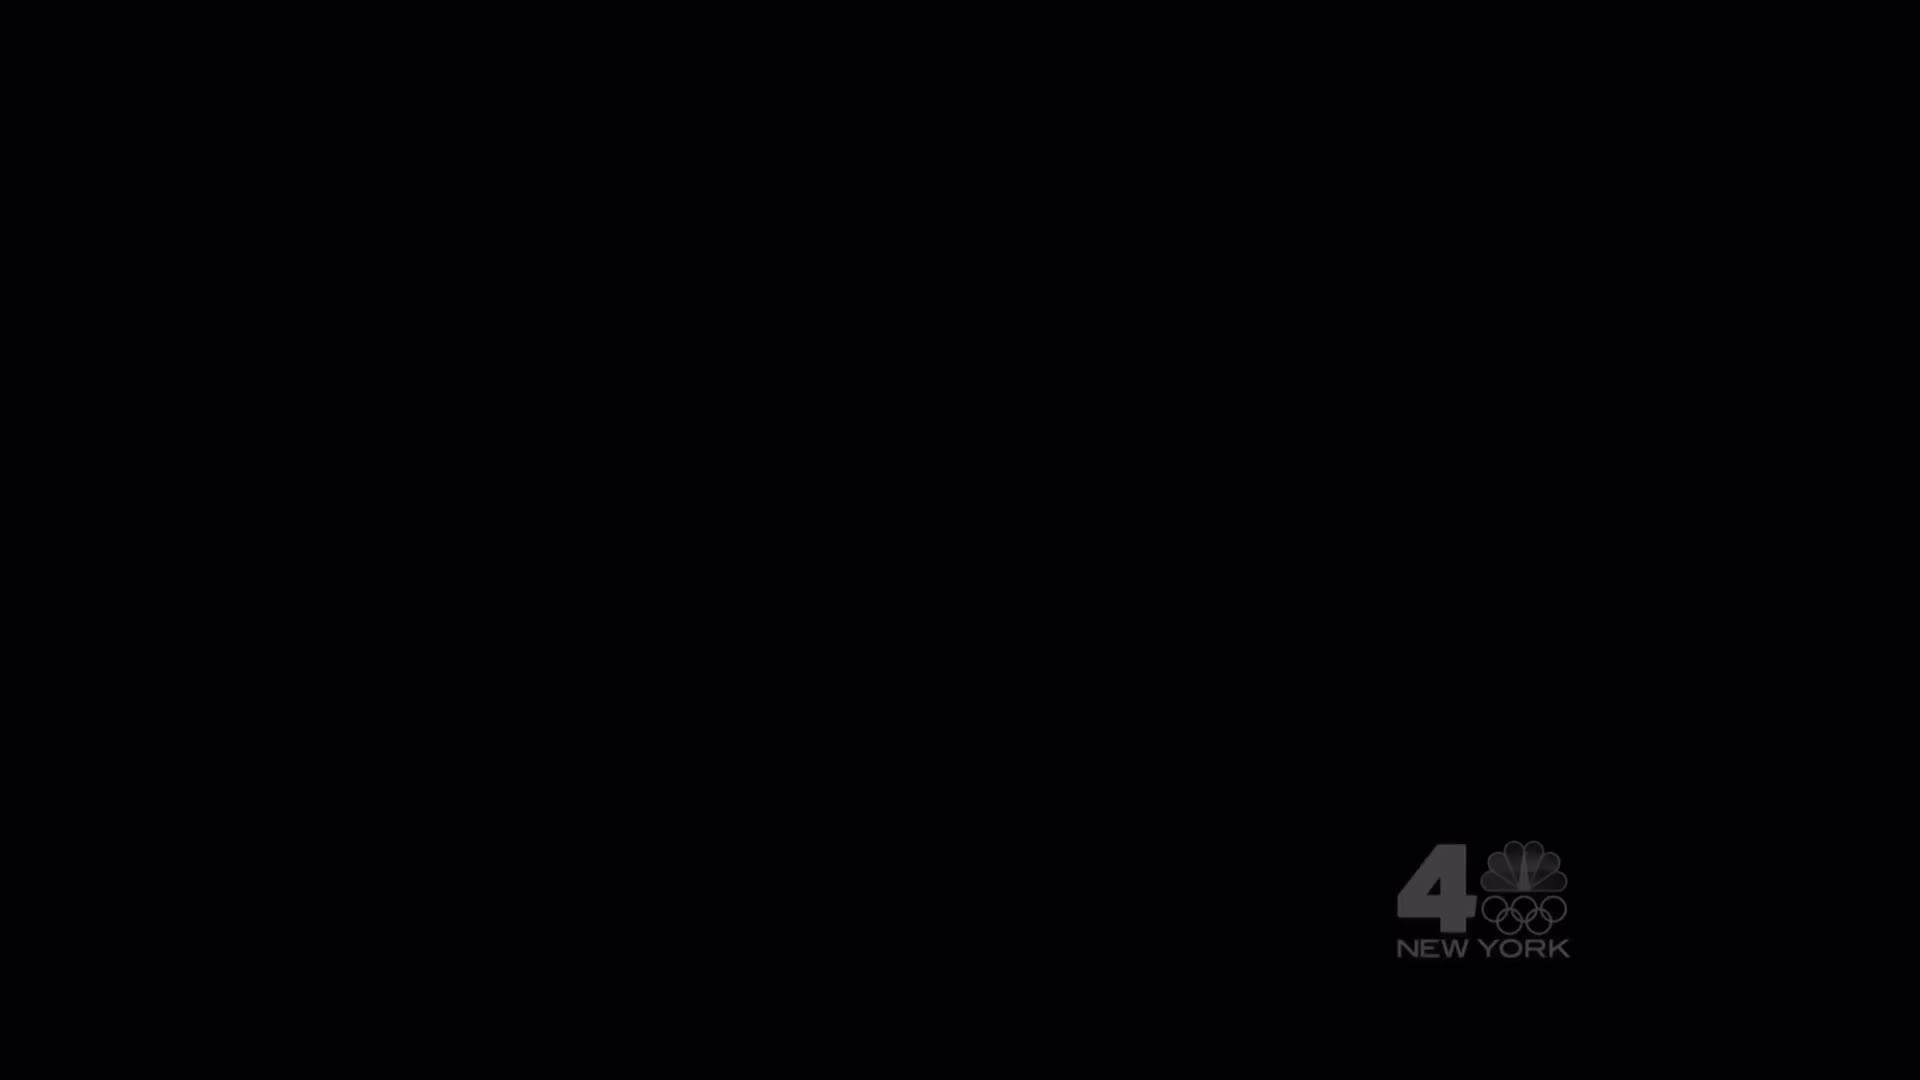 Giada De Laurentiis cleavage! (09 14 2017) GIFs